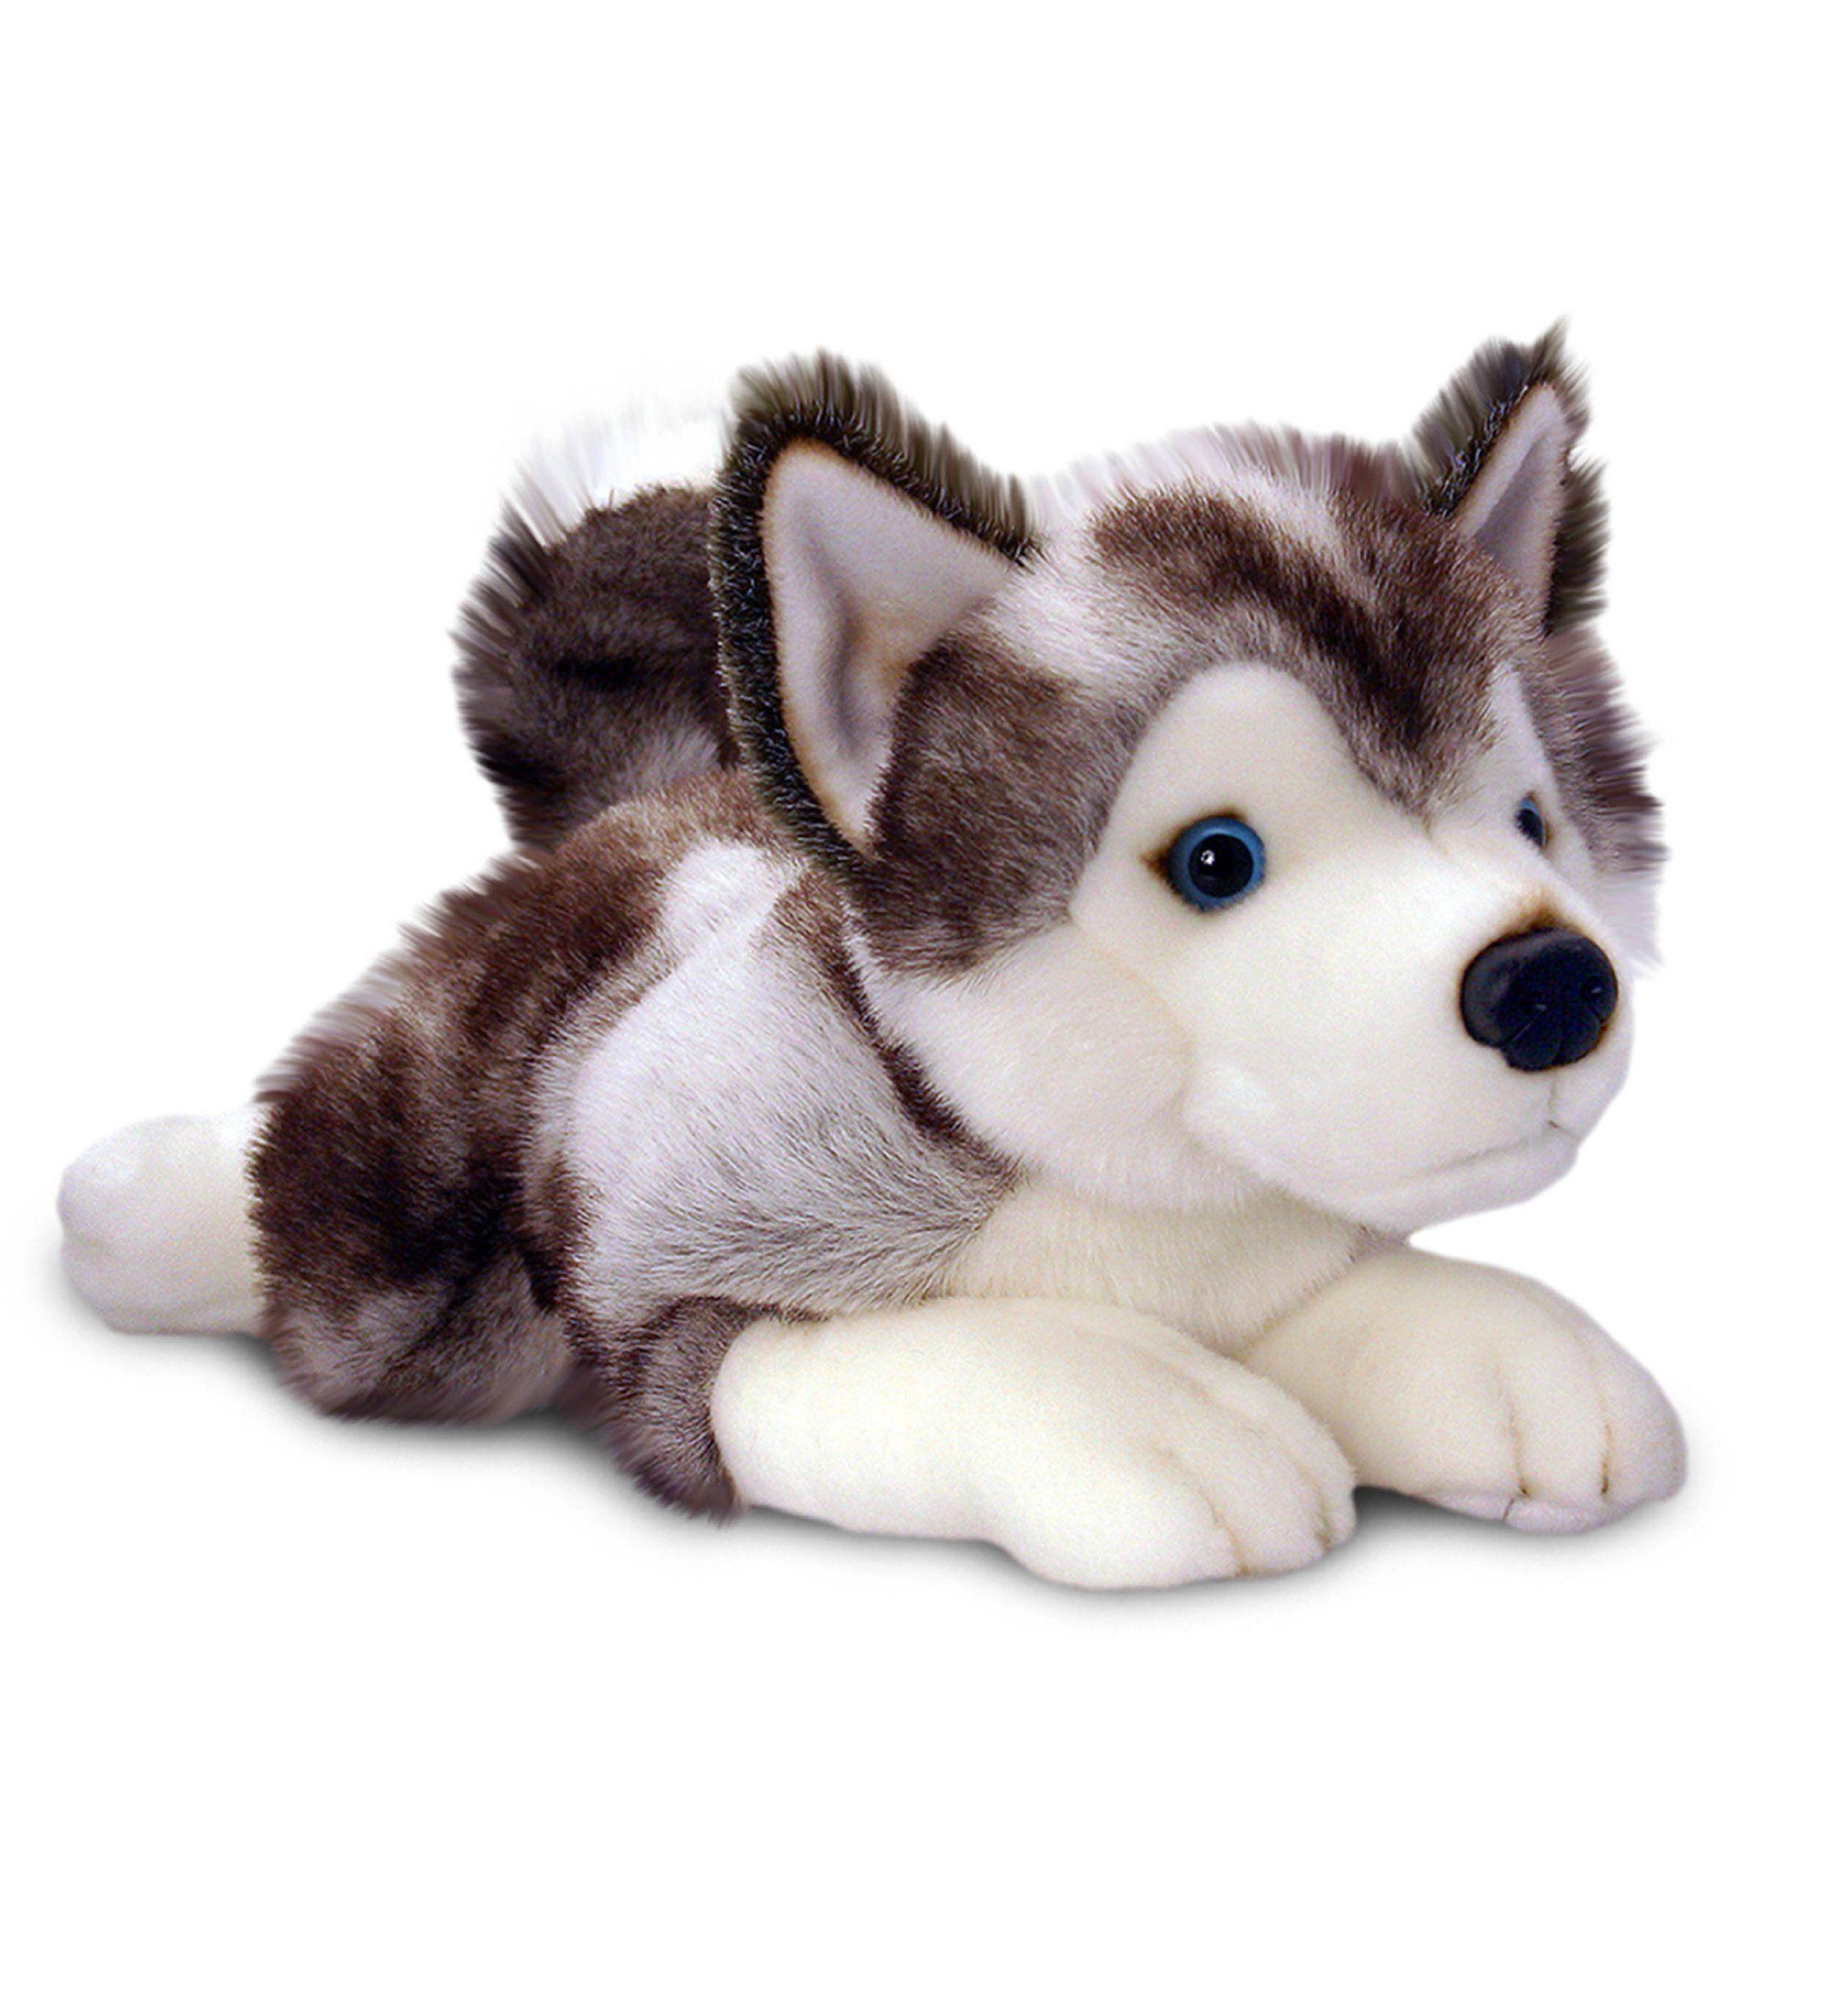 storm the husky dog toy 35cm keel toys plush cuddly soft toy amazon